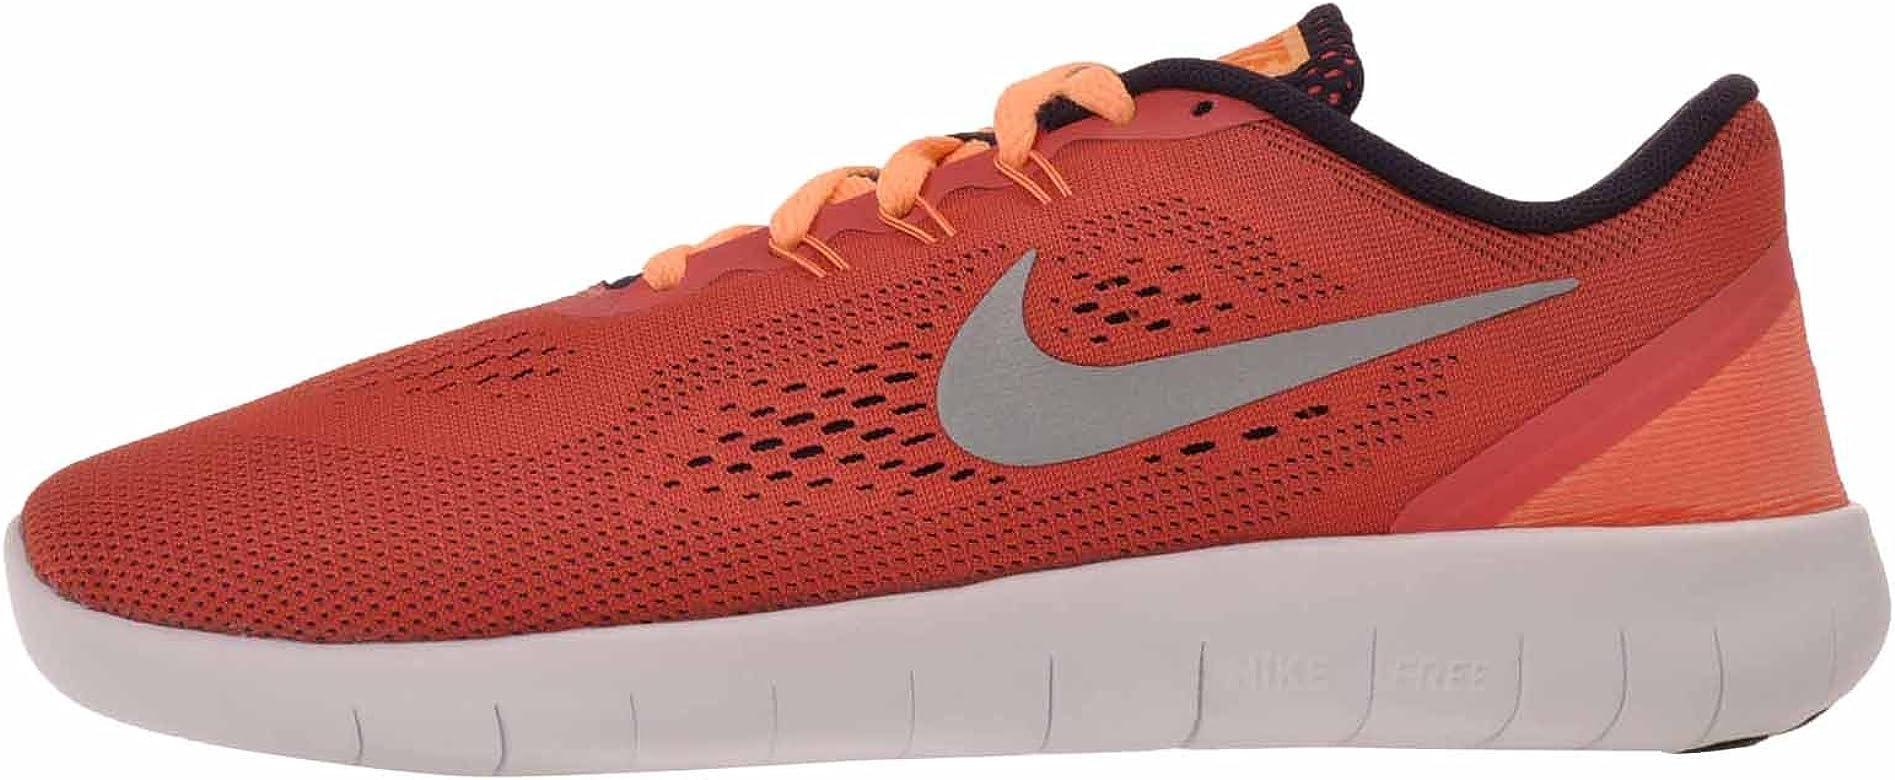 Nike 833993-801, Zapatillas de Trail Running para Niñas, Naranja (Ember Glow/Metallic Silver), 36 EU: Amazon.es: Zapatos y complementos